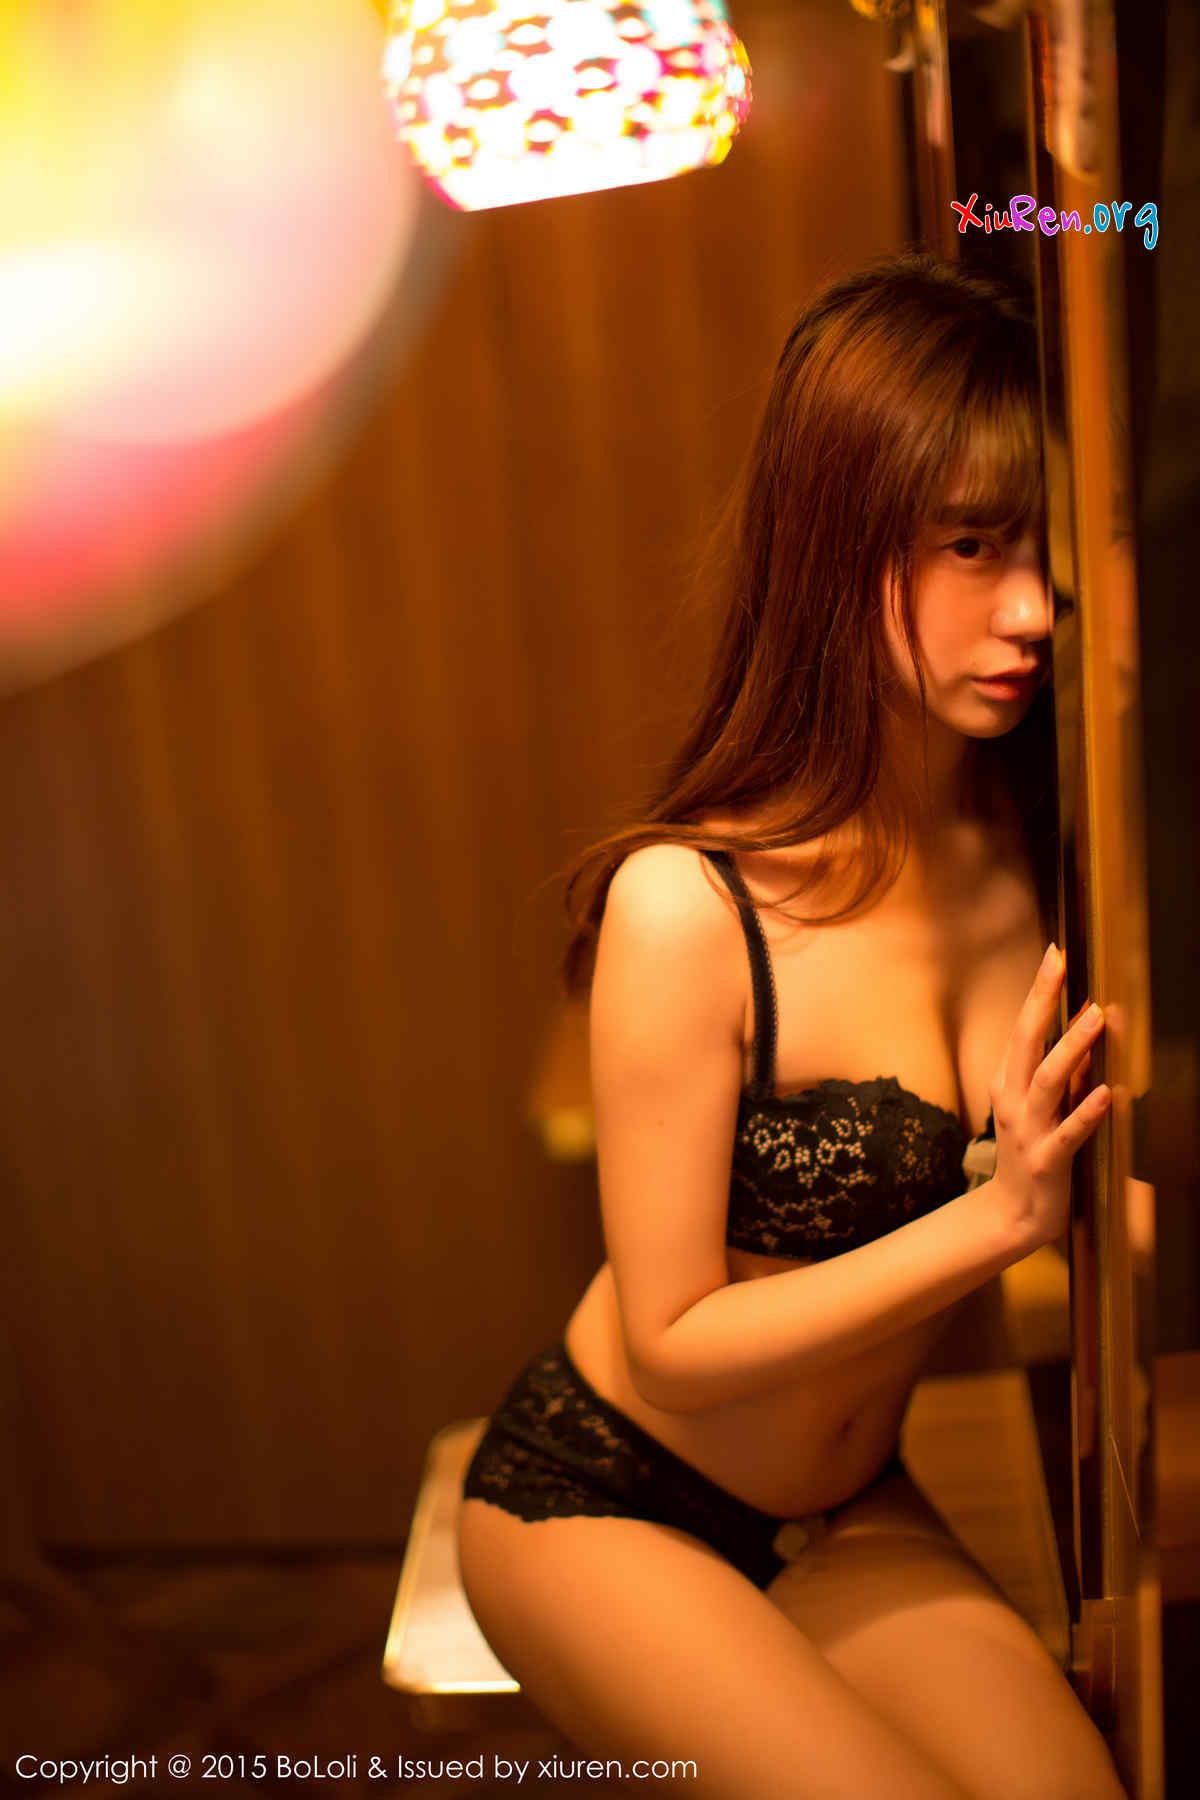 PhimVu-Blog-0048.jpg